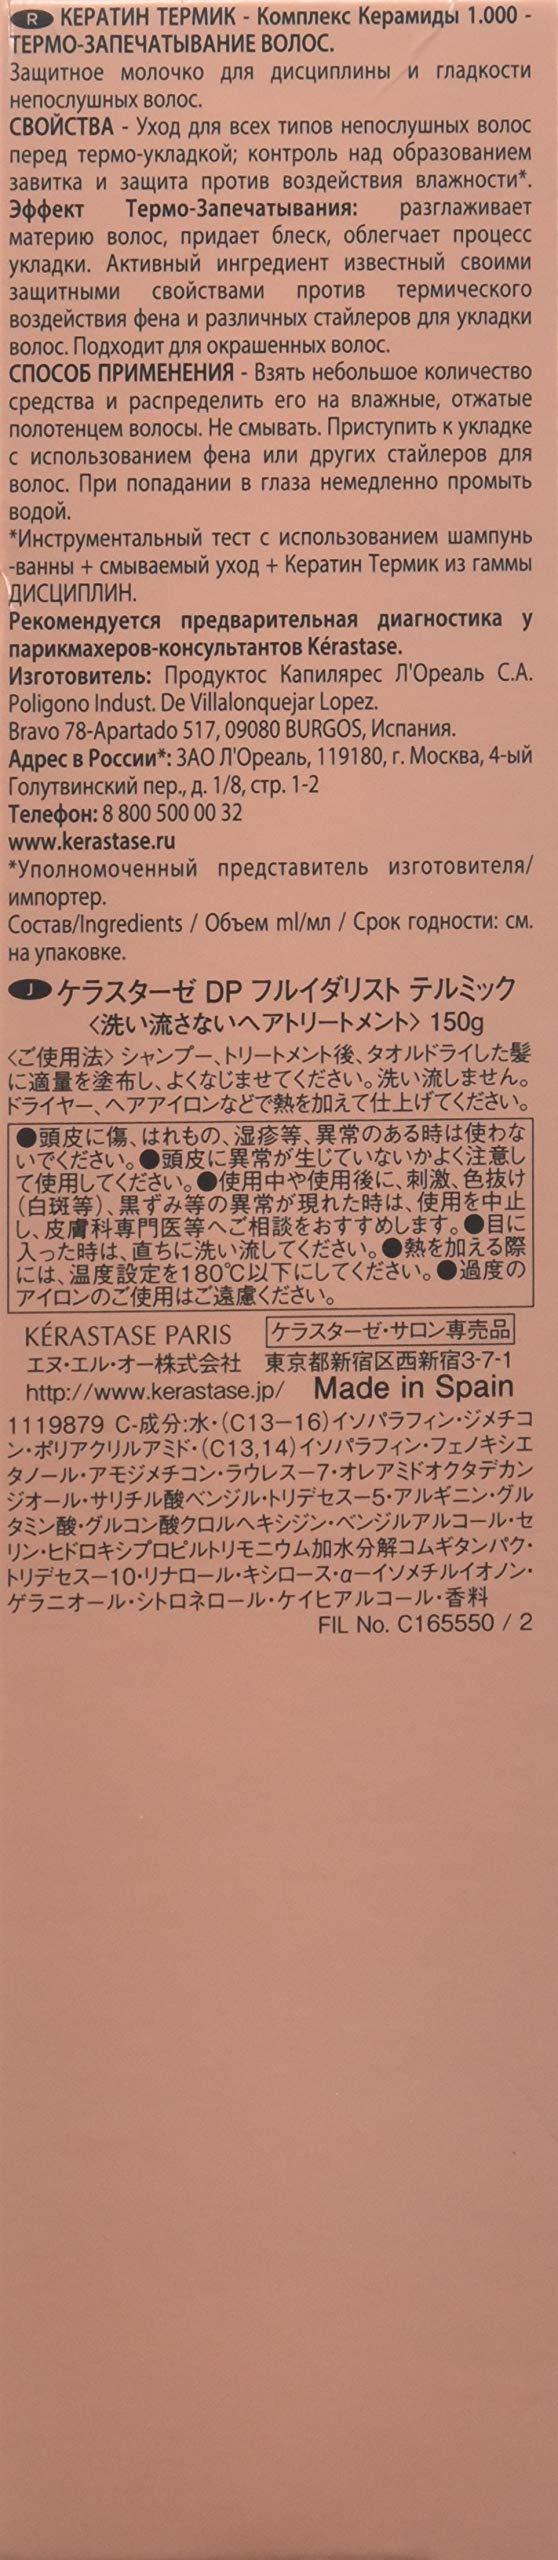 KERASTASE Discipline Keratine Thermique Smoothing Taming Milk Anti-Frizz, 5.1 Ounce